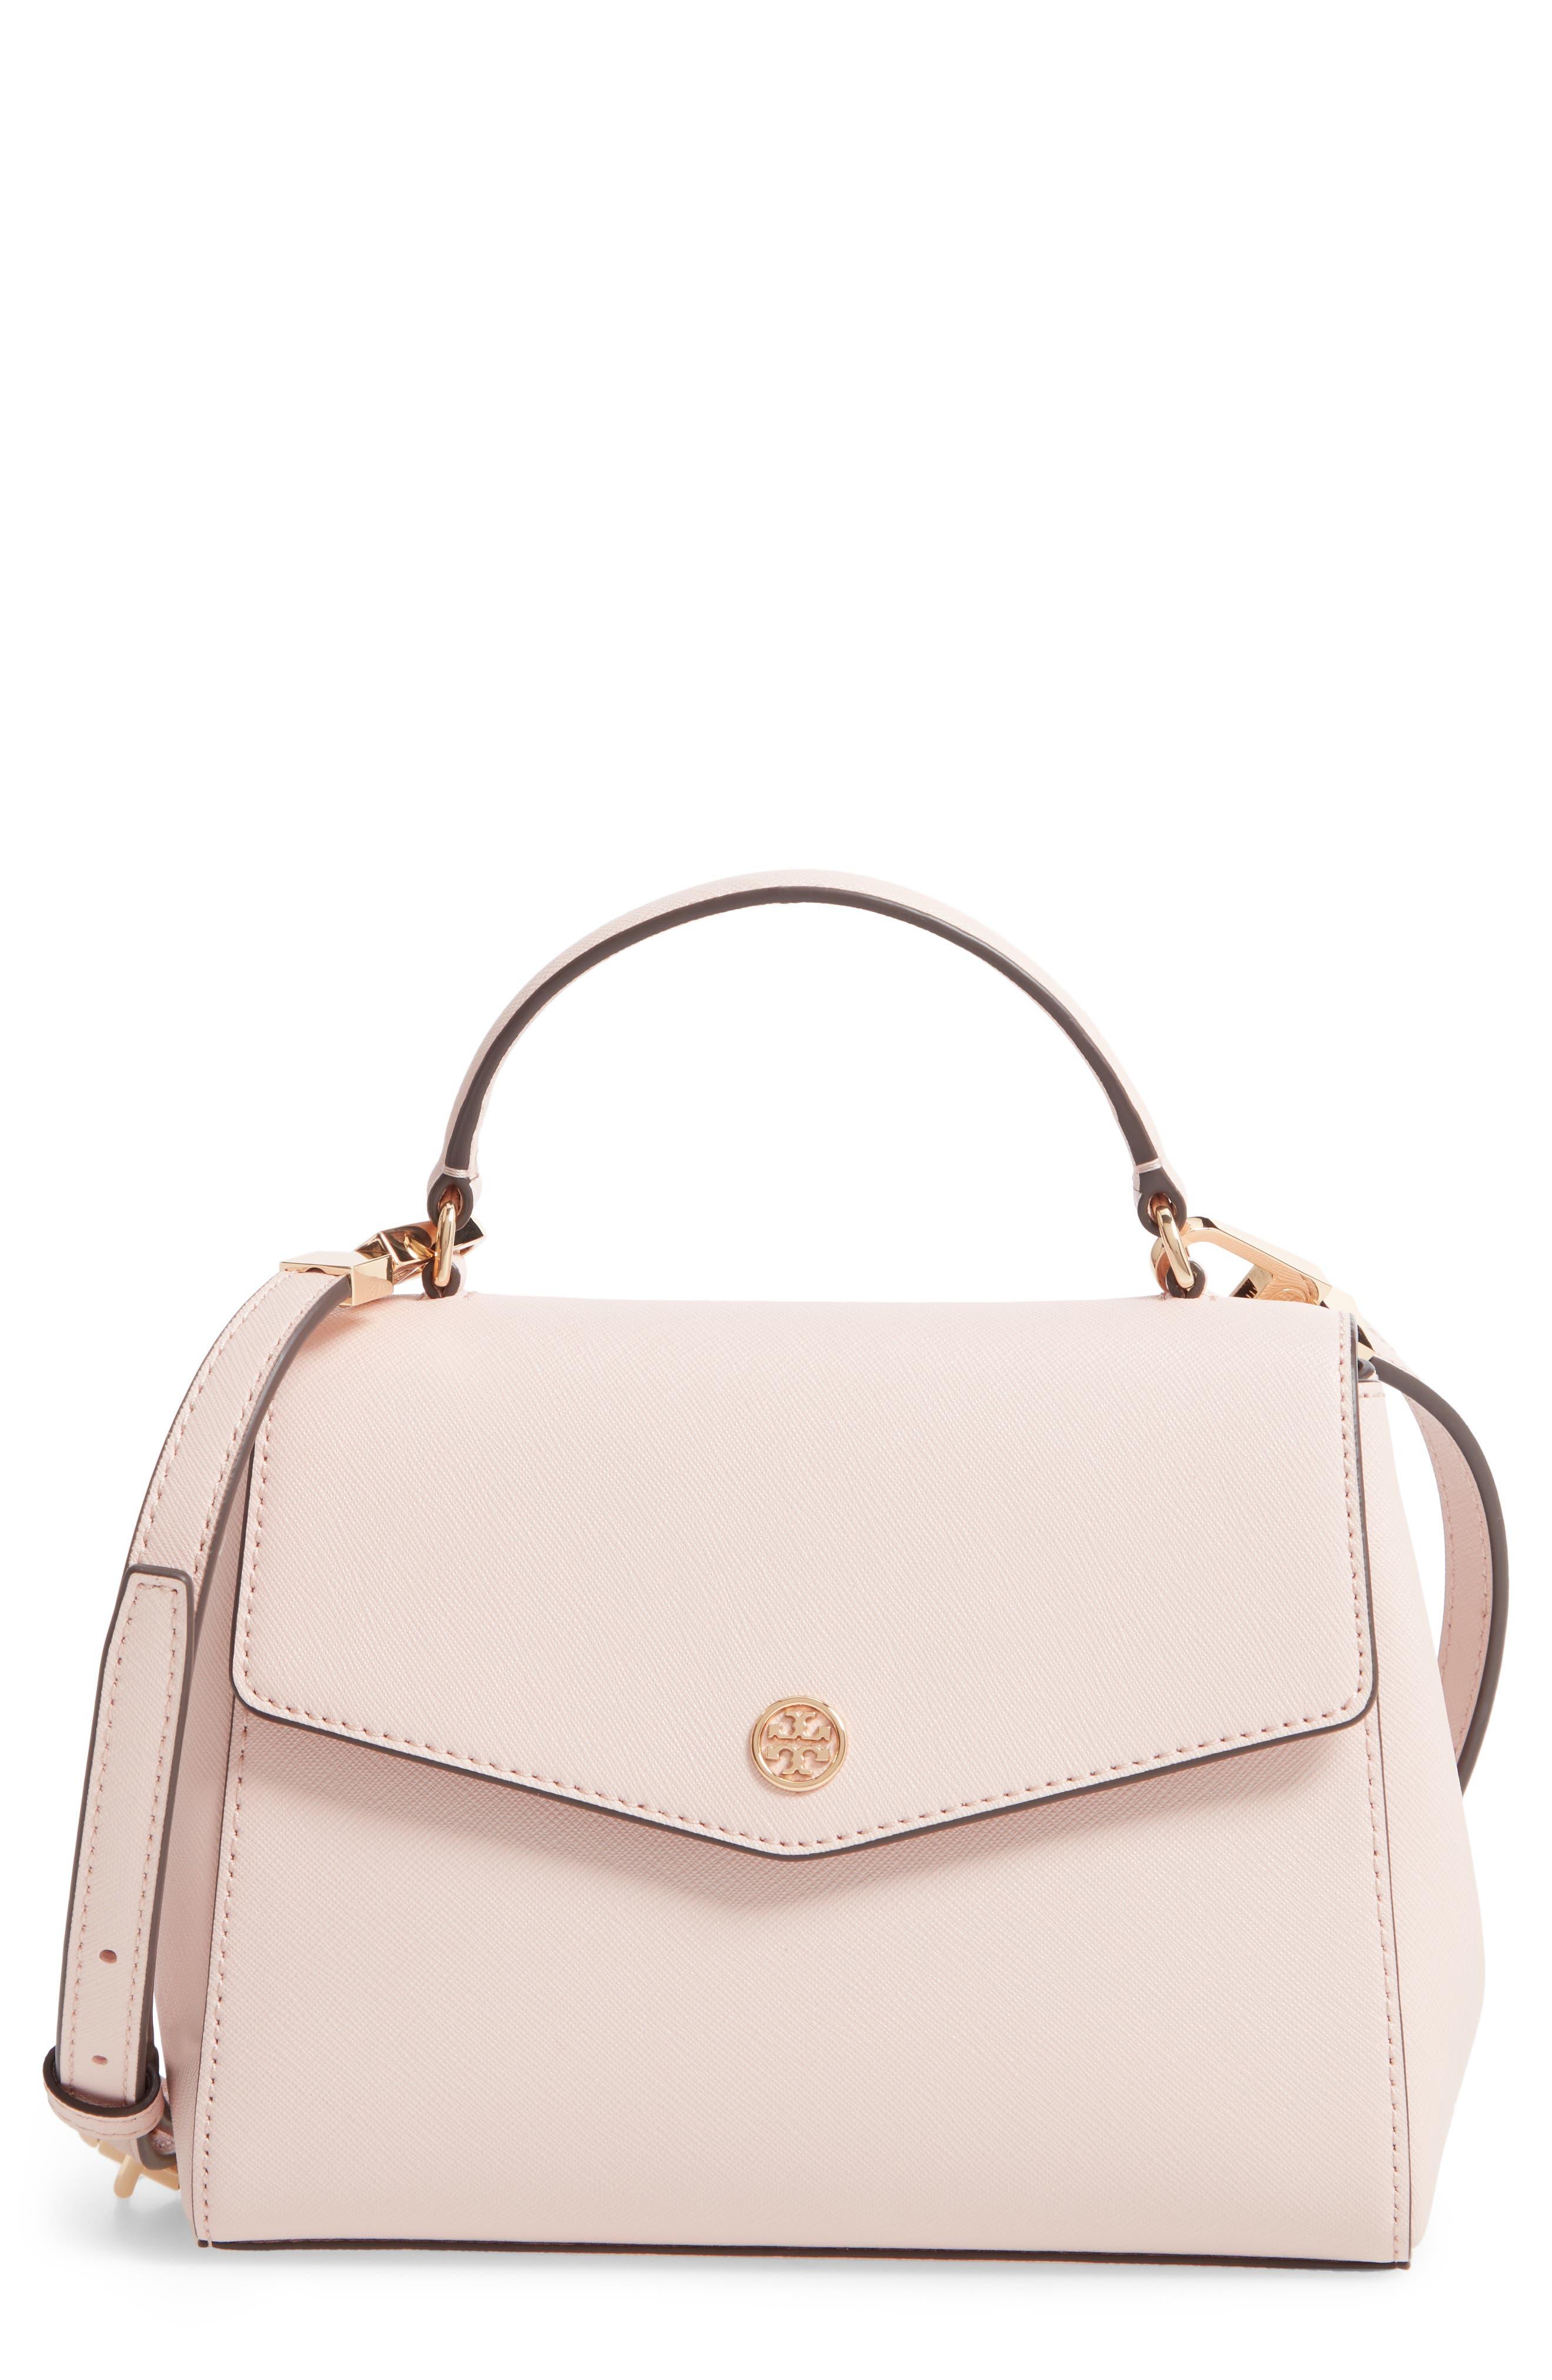 tory burch handbags wallets for women nordstrom rh shop nordstrom com